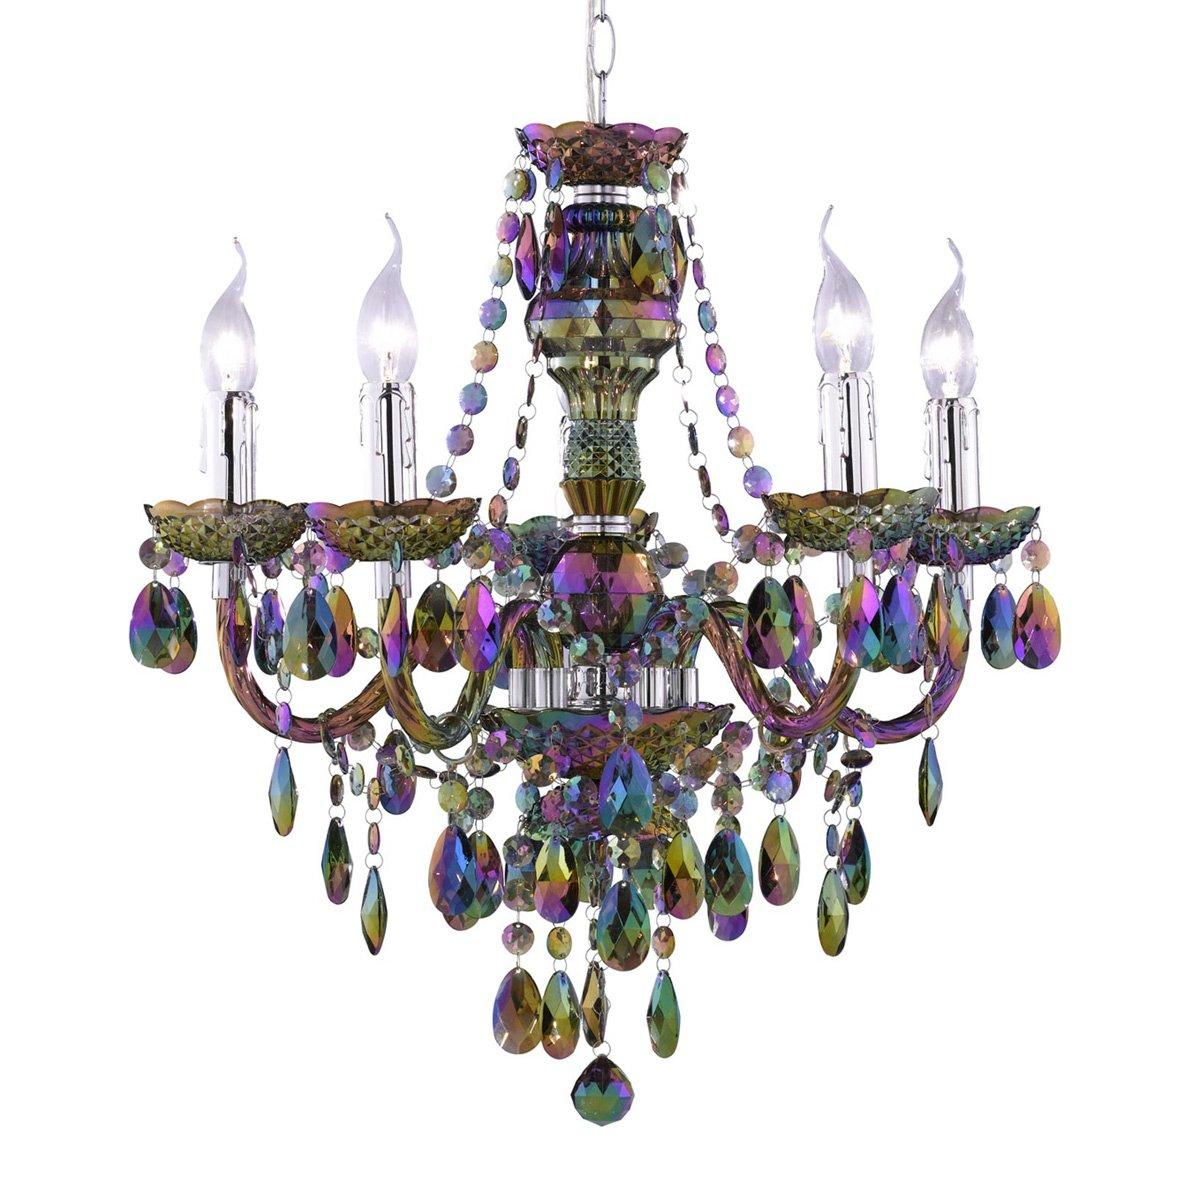 L mpara de techo tipo ara a 5 bombillas arcoiris l mpara de techo tipo ara a con 5 puntos - Lamparas de arana de cristal ...